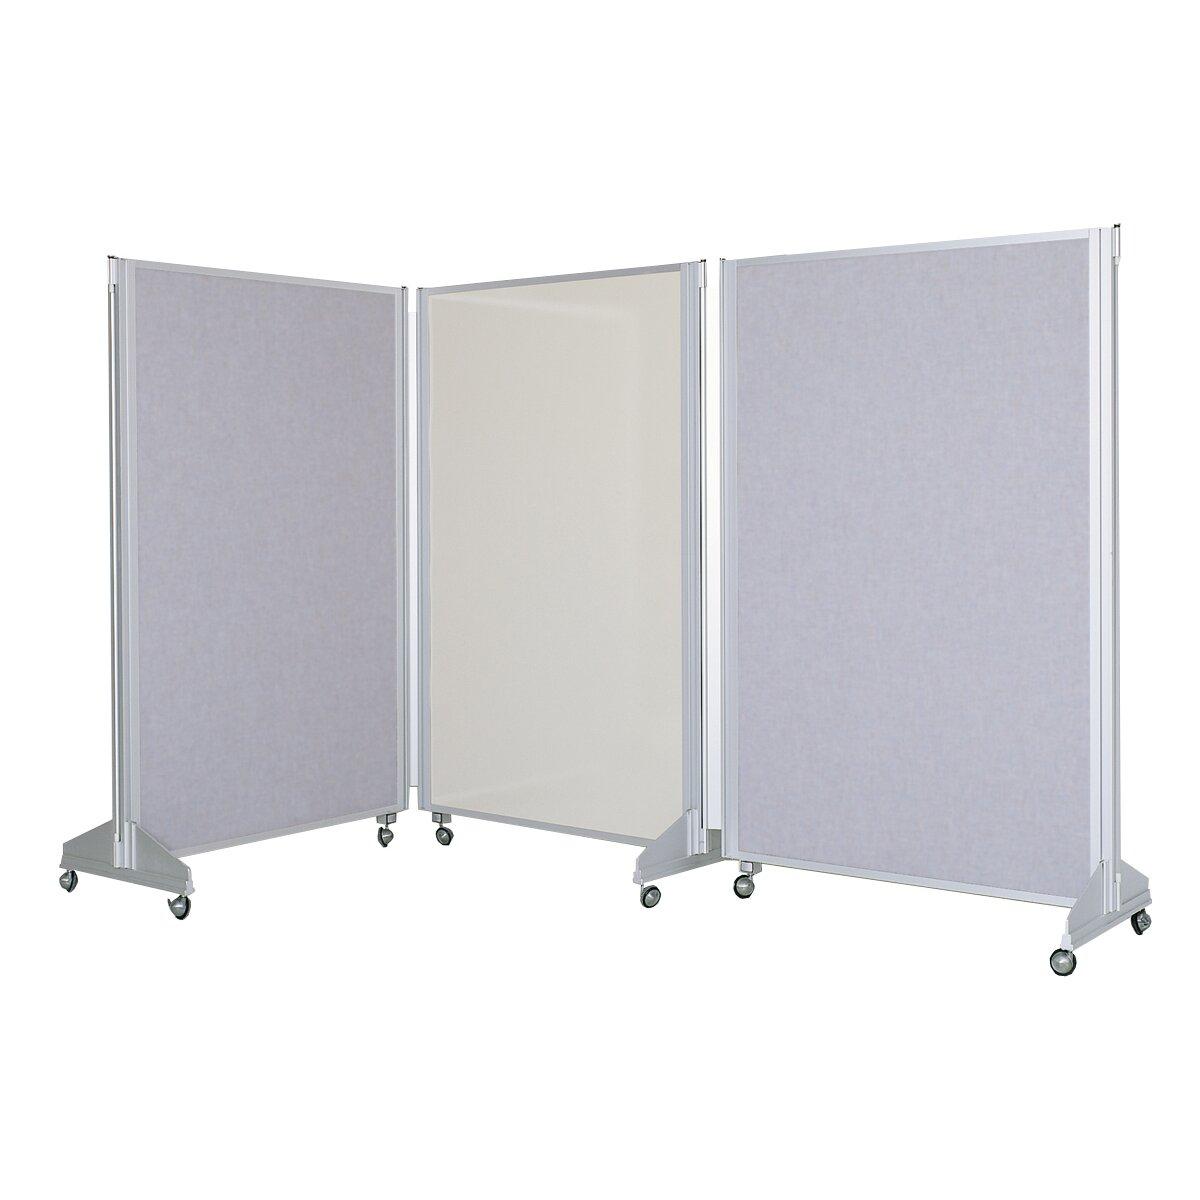 portable free standing whiteboard. Black Bedroom Furniture Sets. Home Design Ideas